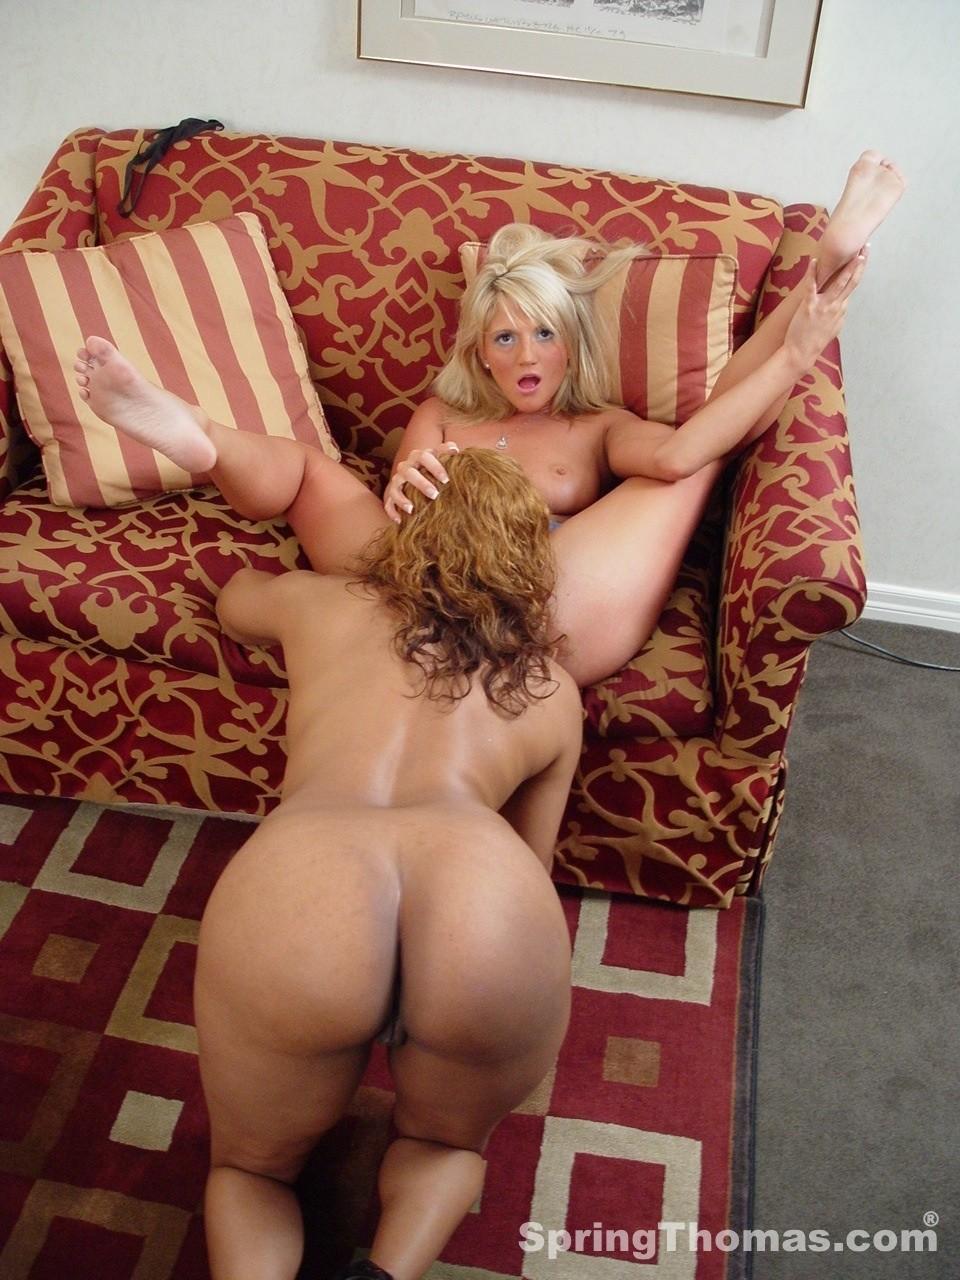 Две негритянки ебут белую лесбиянку. Фото - 7